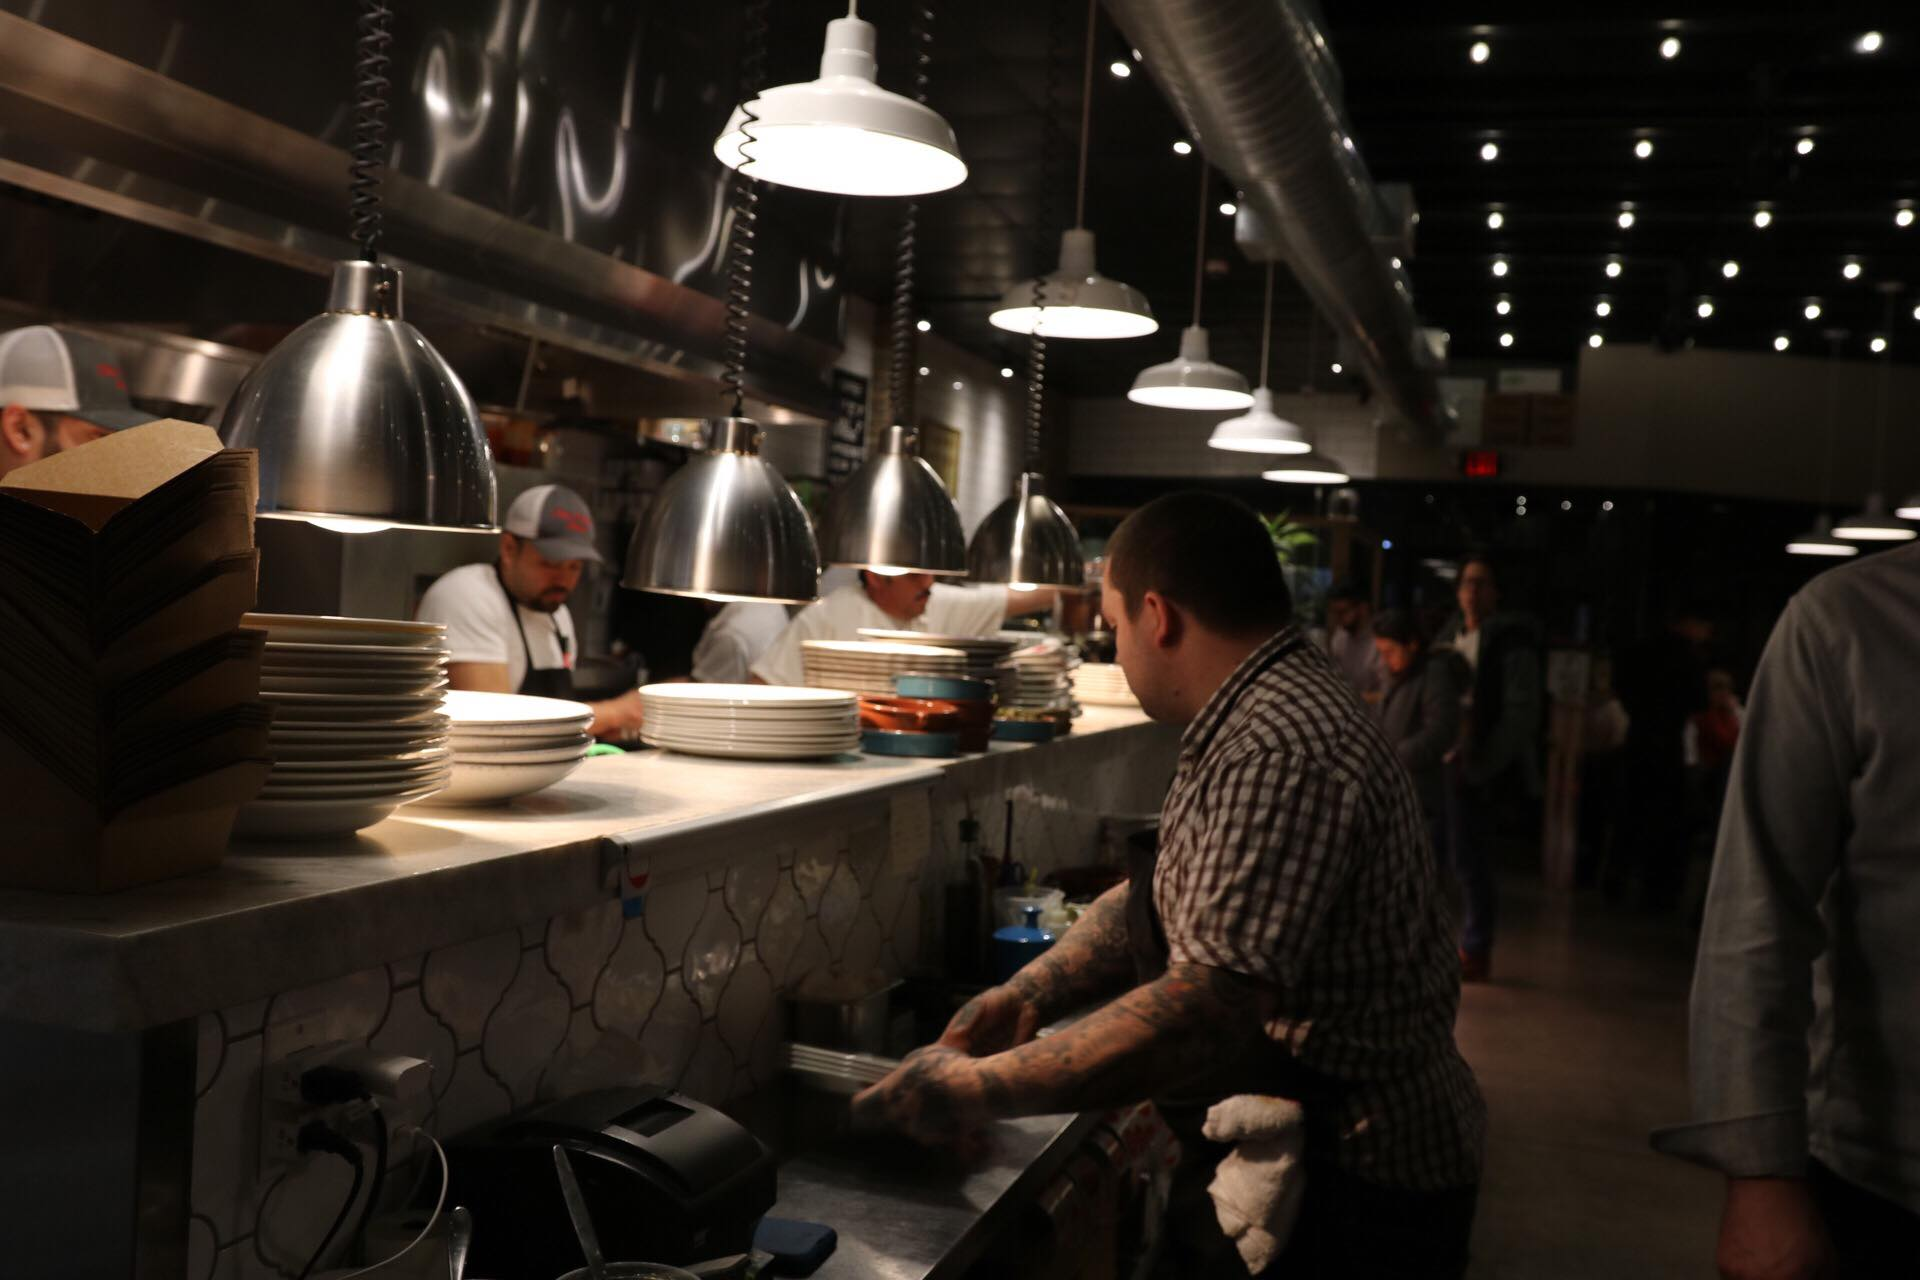 pasta shop chef expiditing.jpg